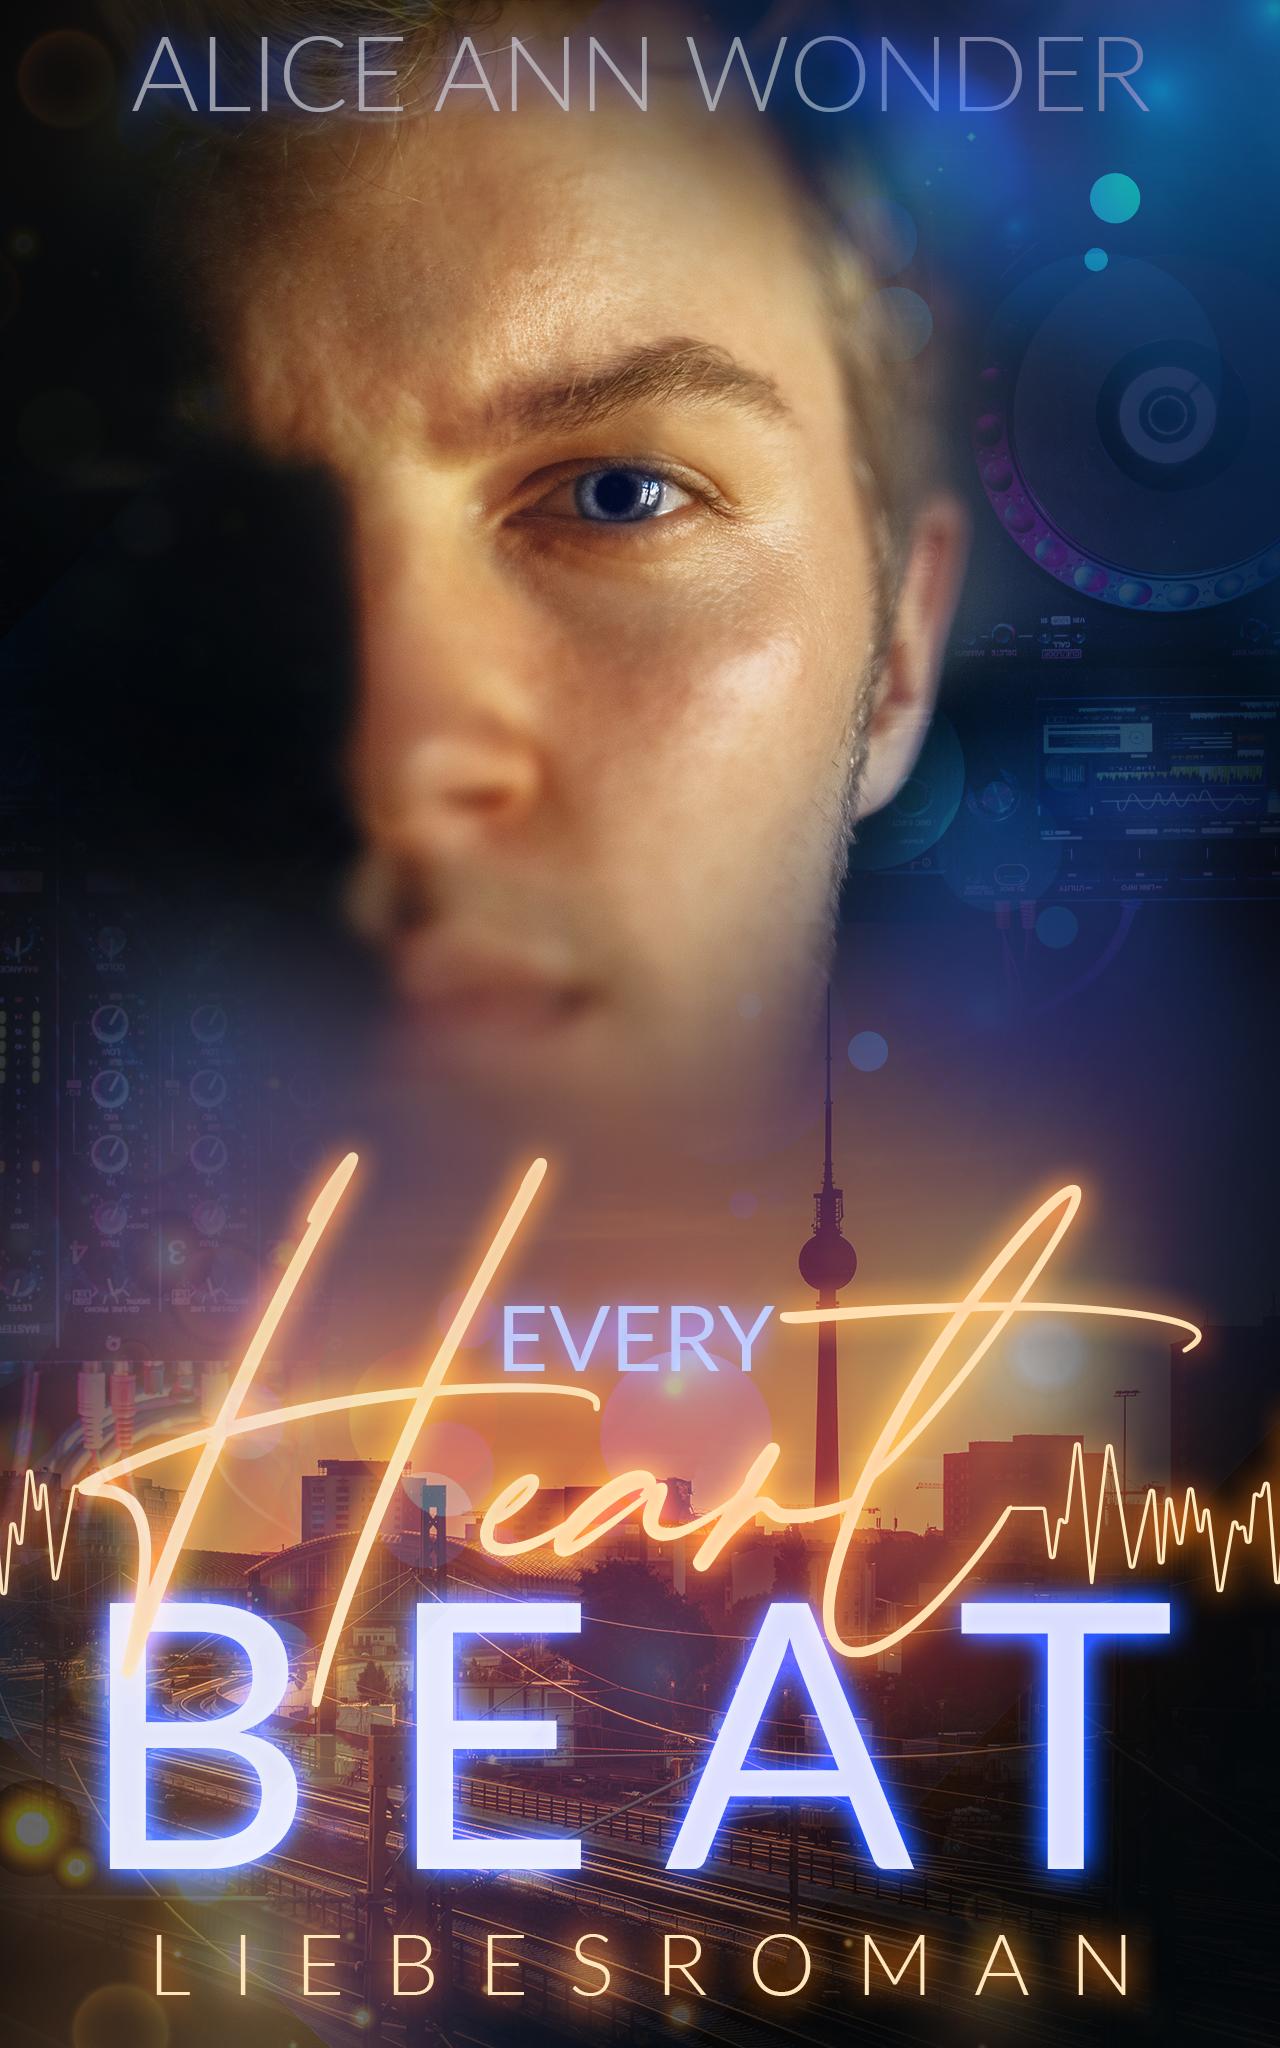 EveryHeartBeat